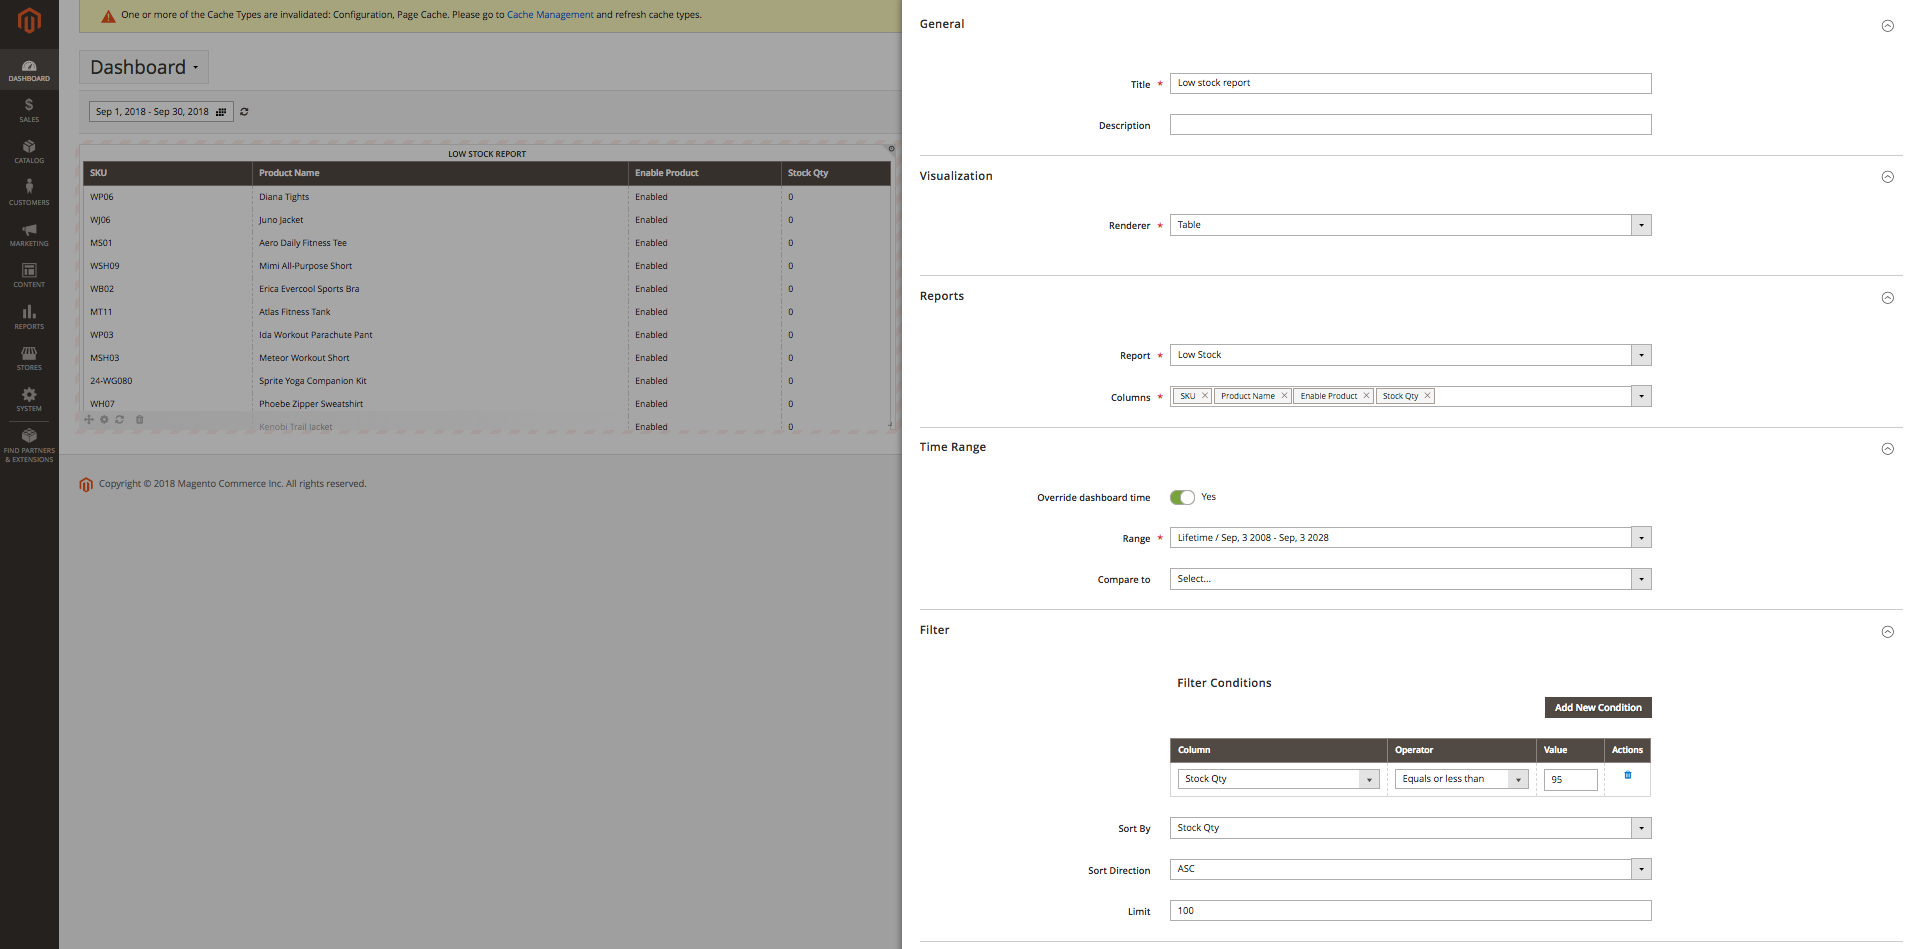 Low Stock widget configuration